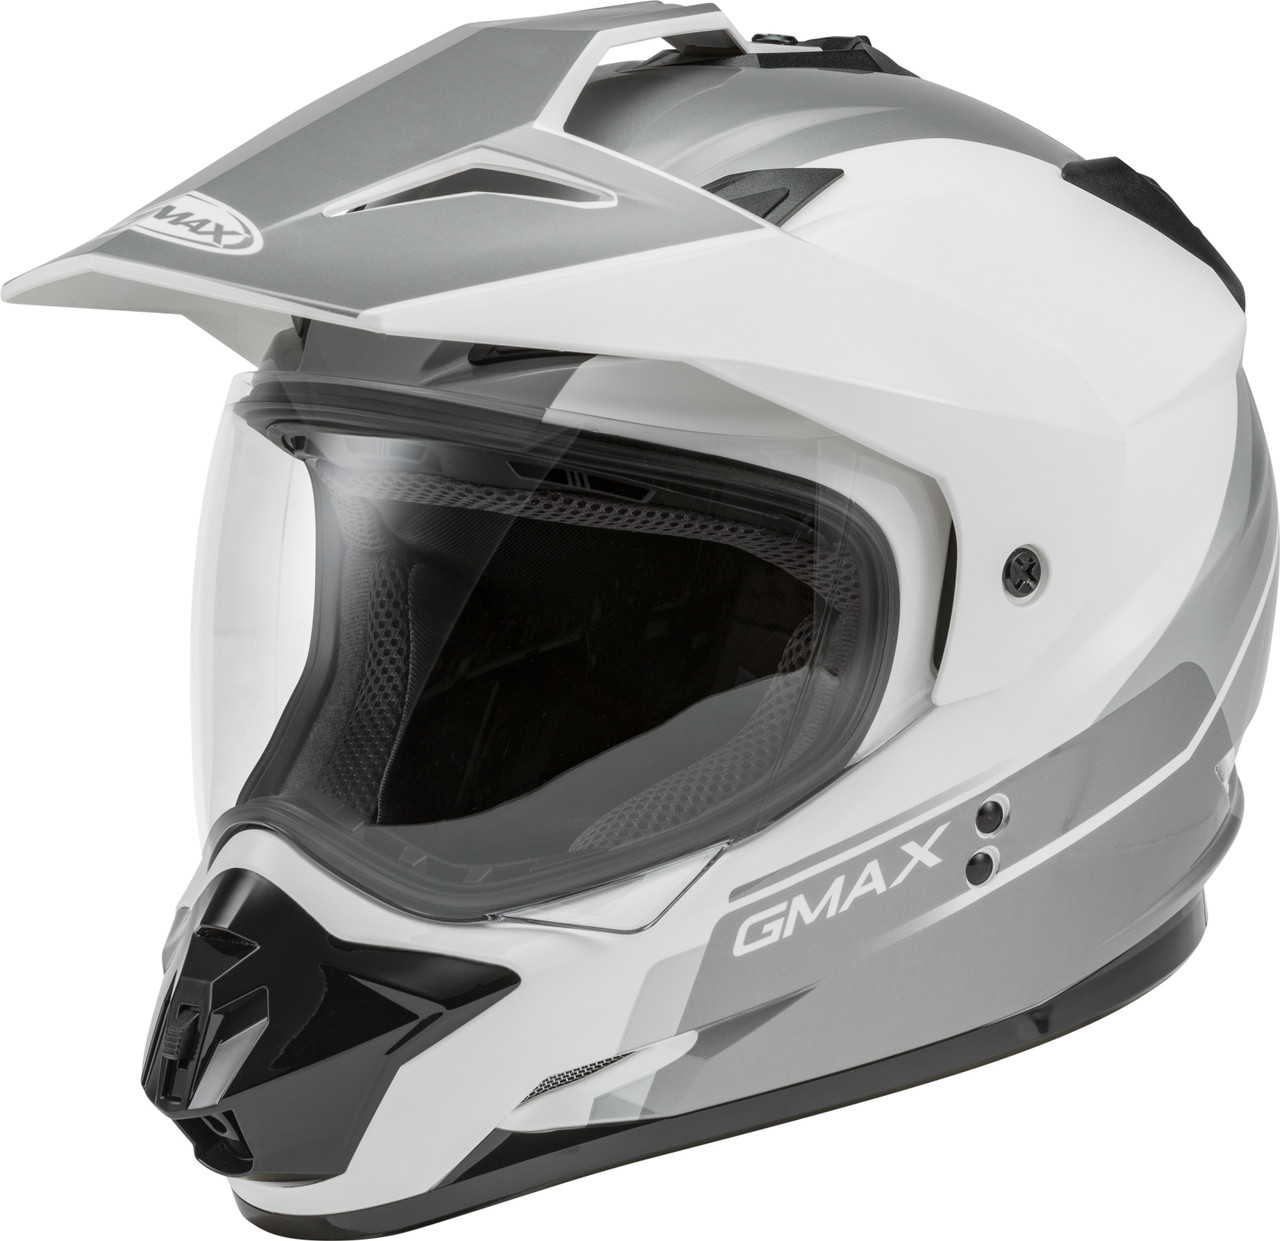 Snow White Street Helmet FREE SHIPPING